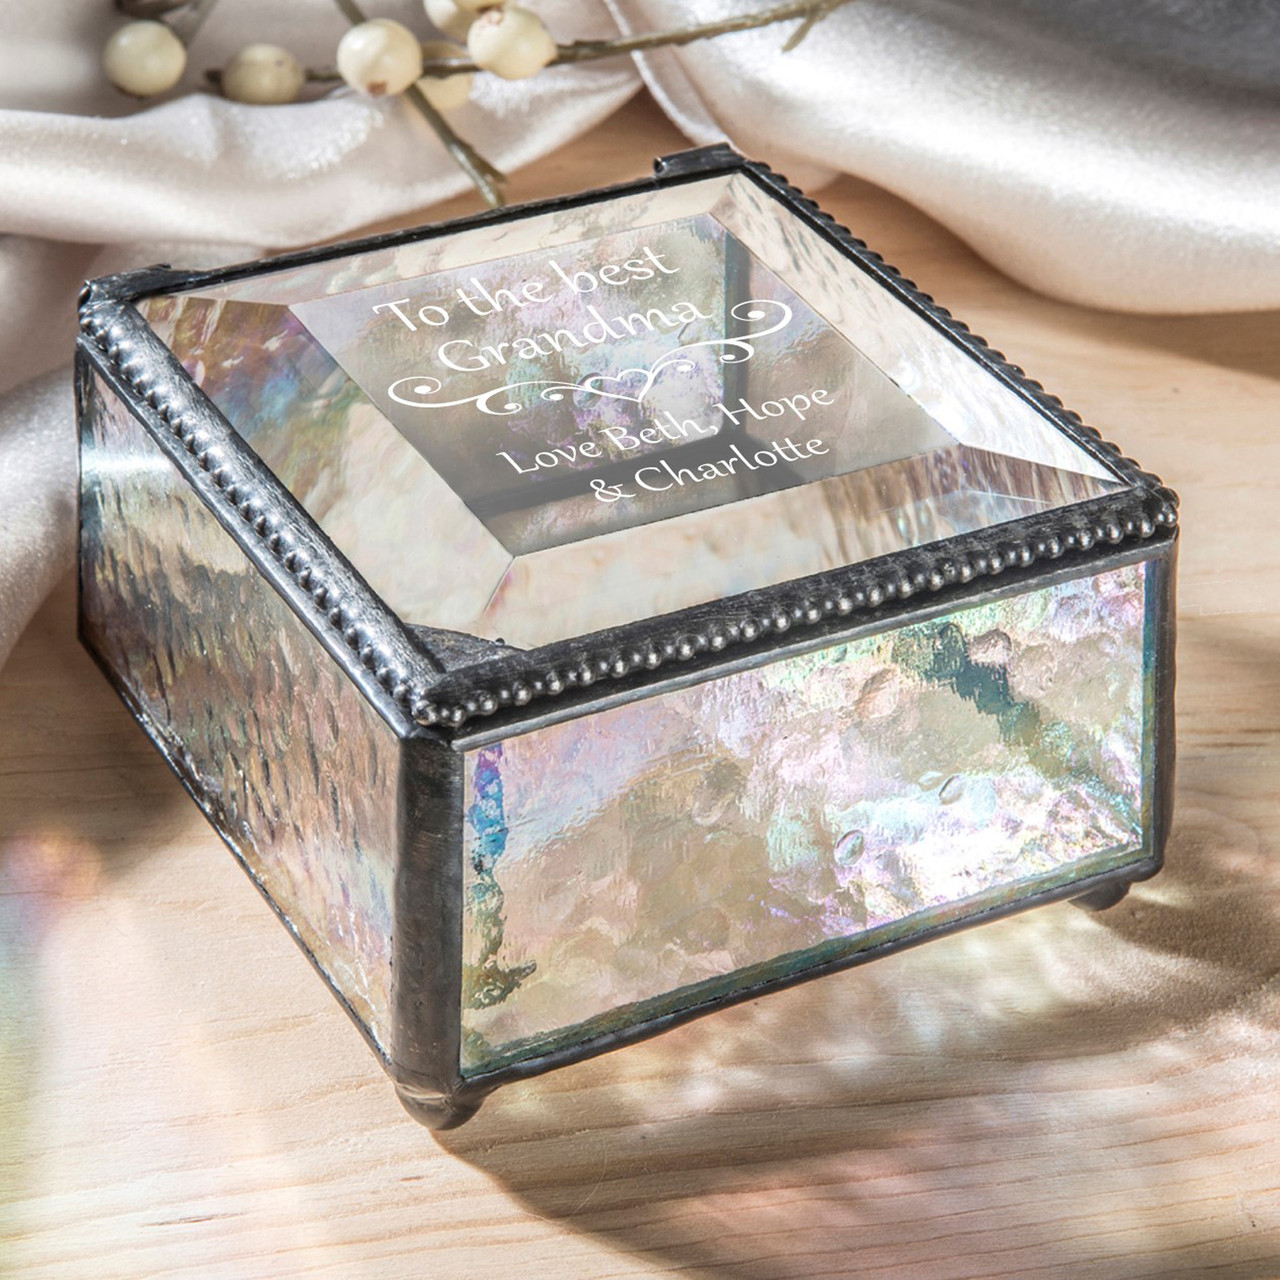 Personalized Grandma Box J Devlin